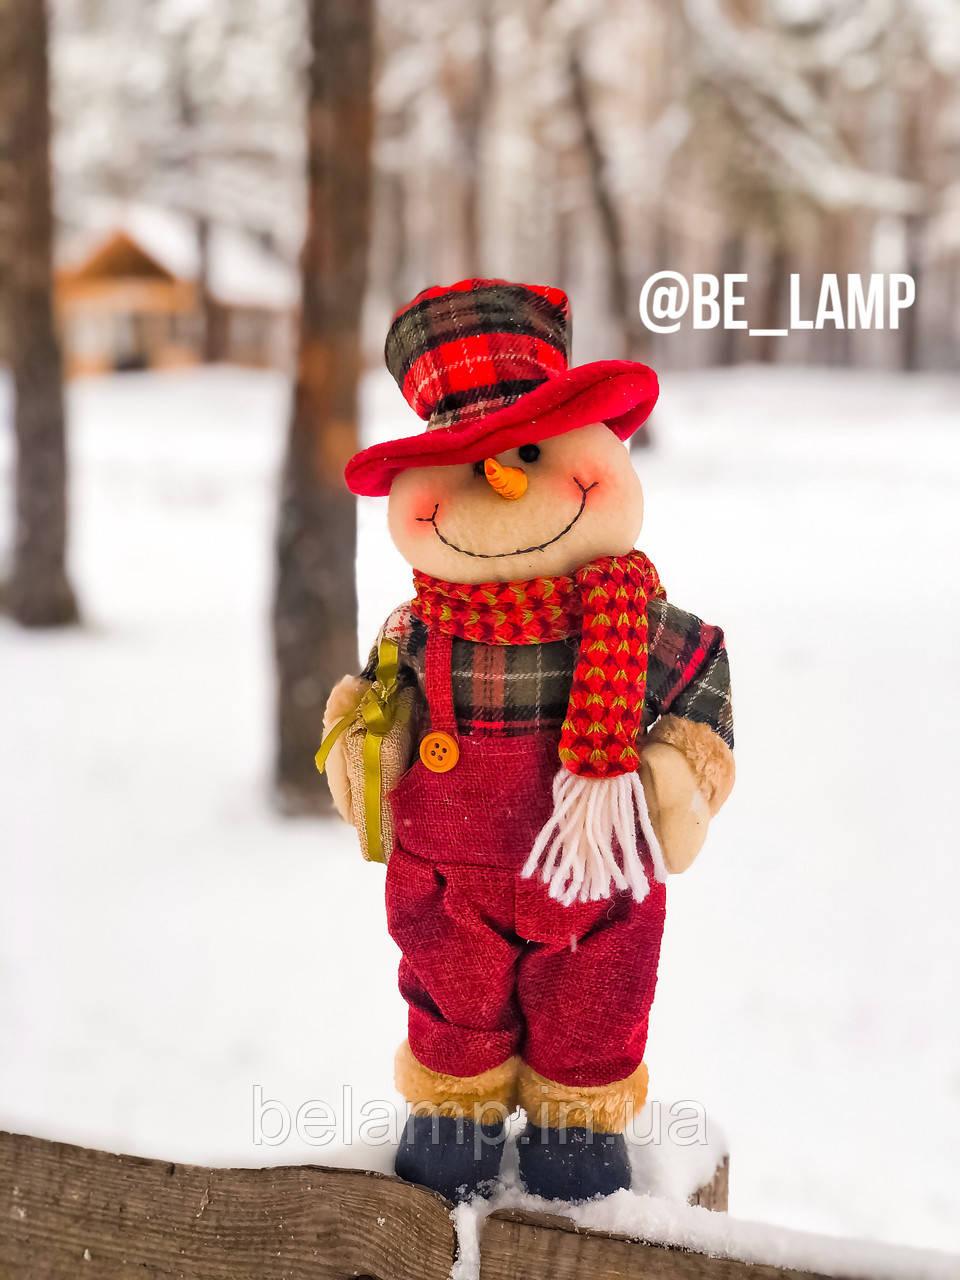 Новогоднее украшение фигурка  под ёлку Снеговик